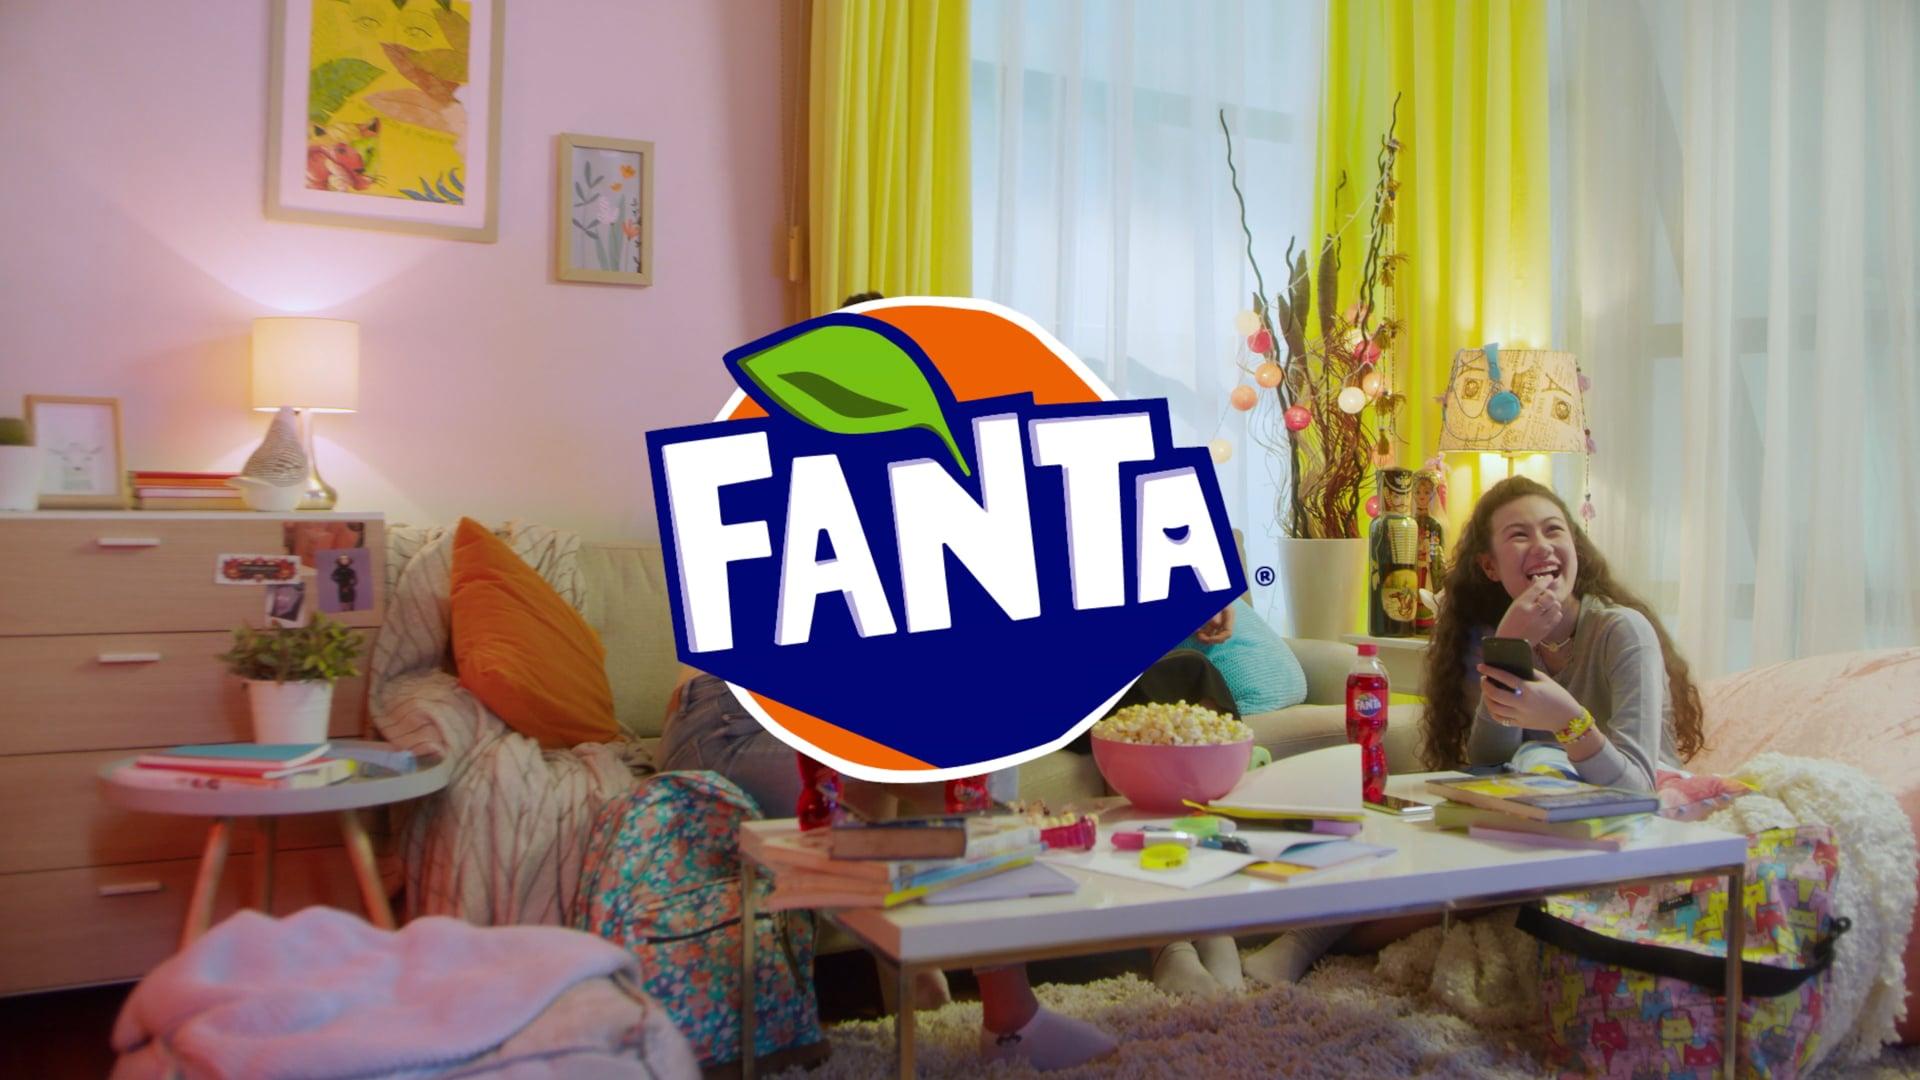 Fanta   Study Group (Indonesia)